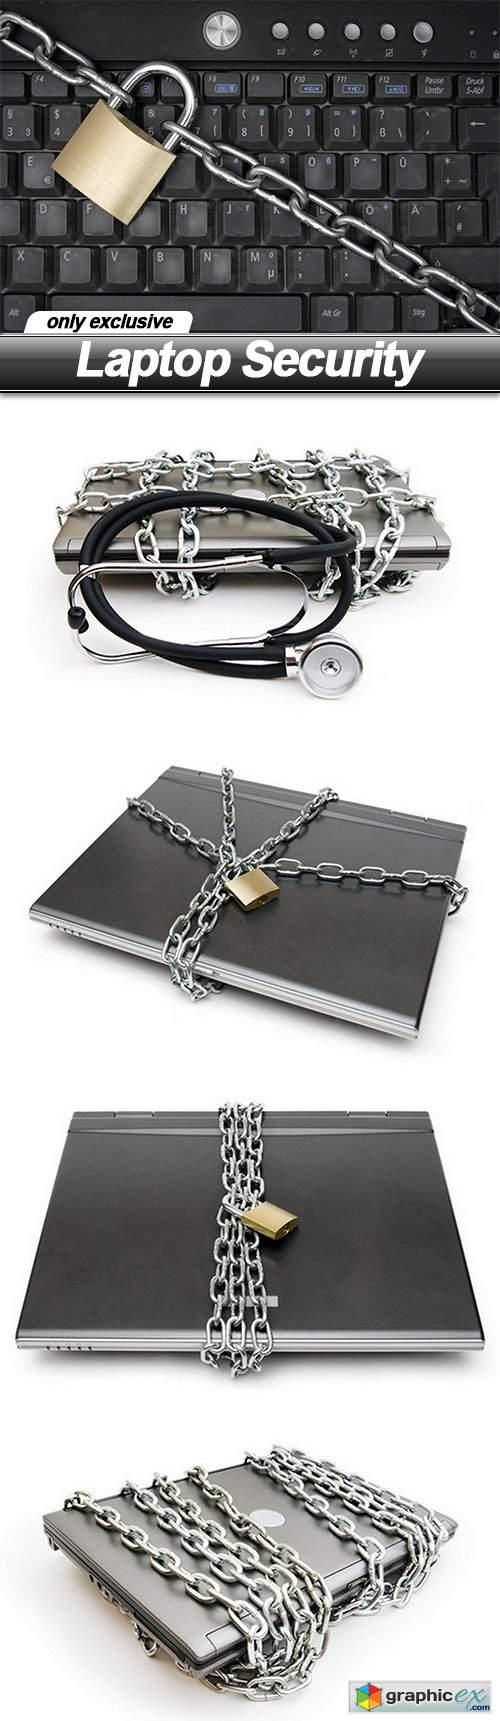 Laptop Security - 5 UHQ JPEG